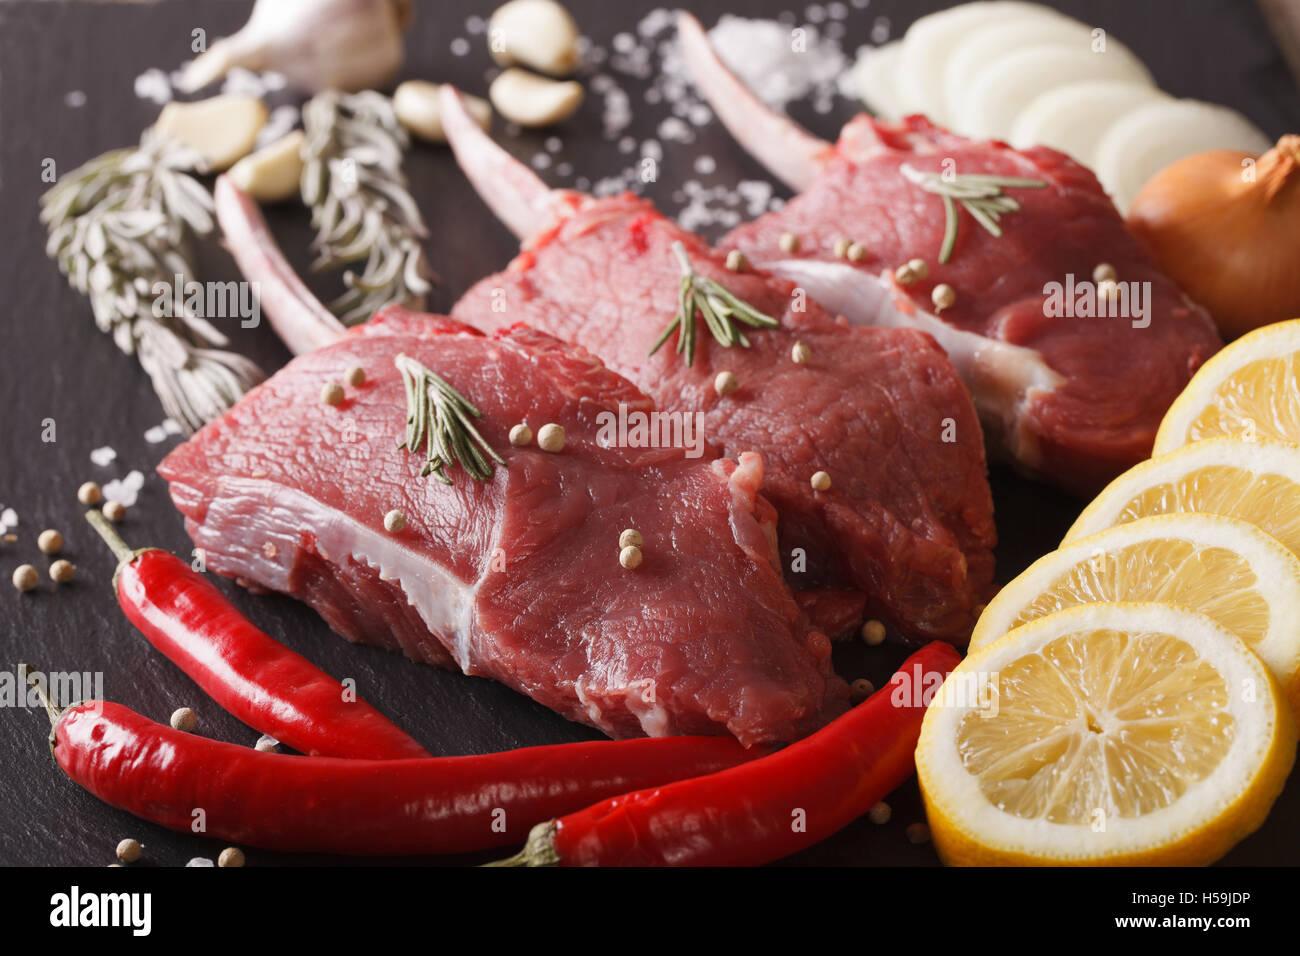 Filete de carne cruda con especias sobre una mesa de piedra negra closeup horizontal. Foto de stock